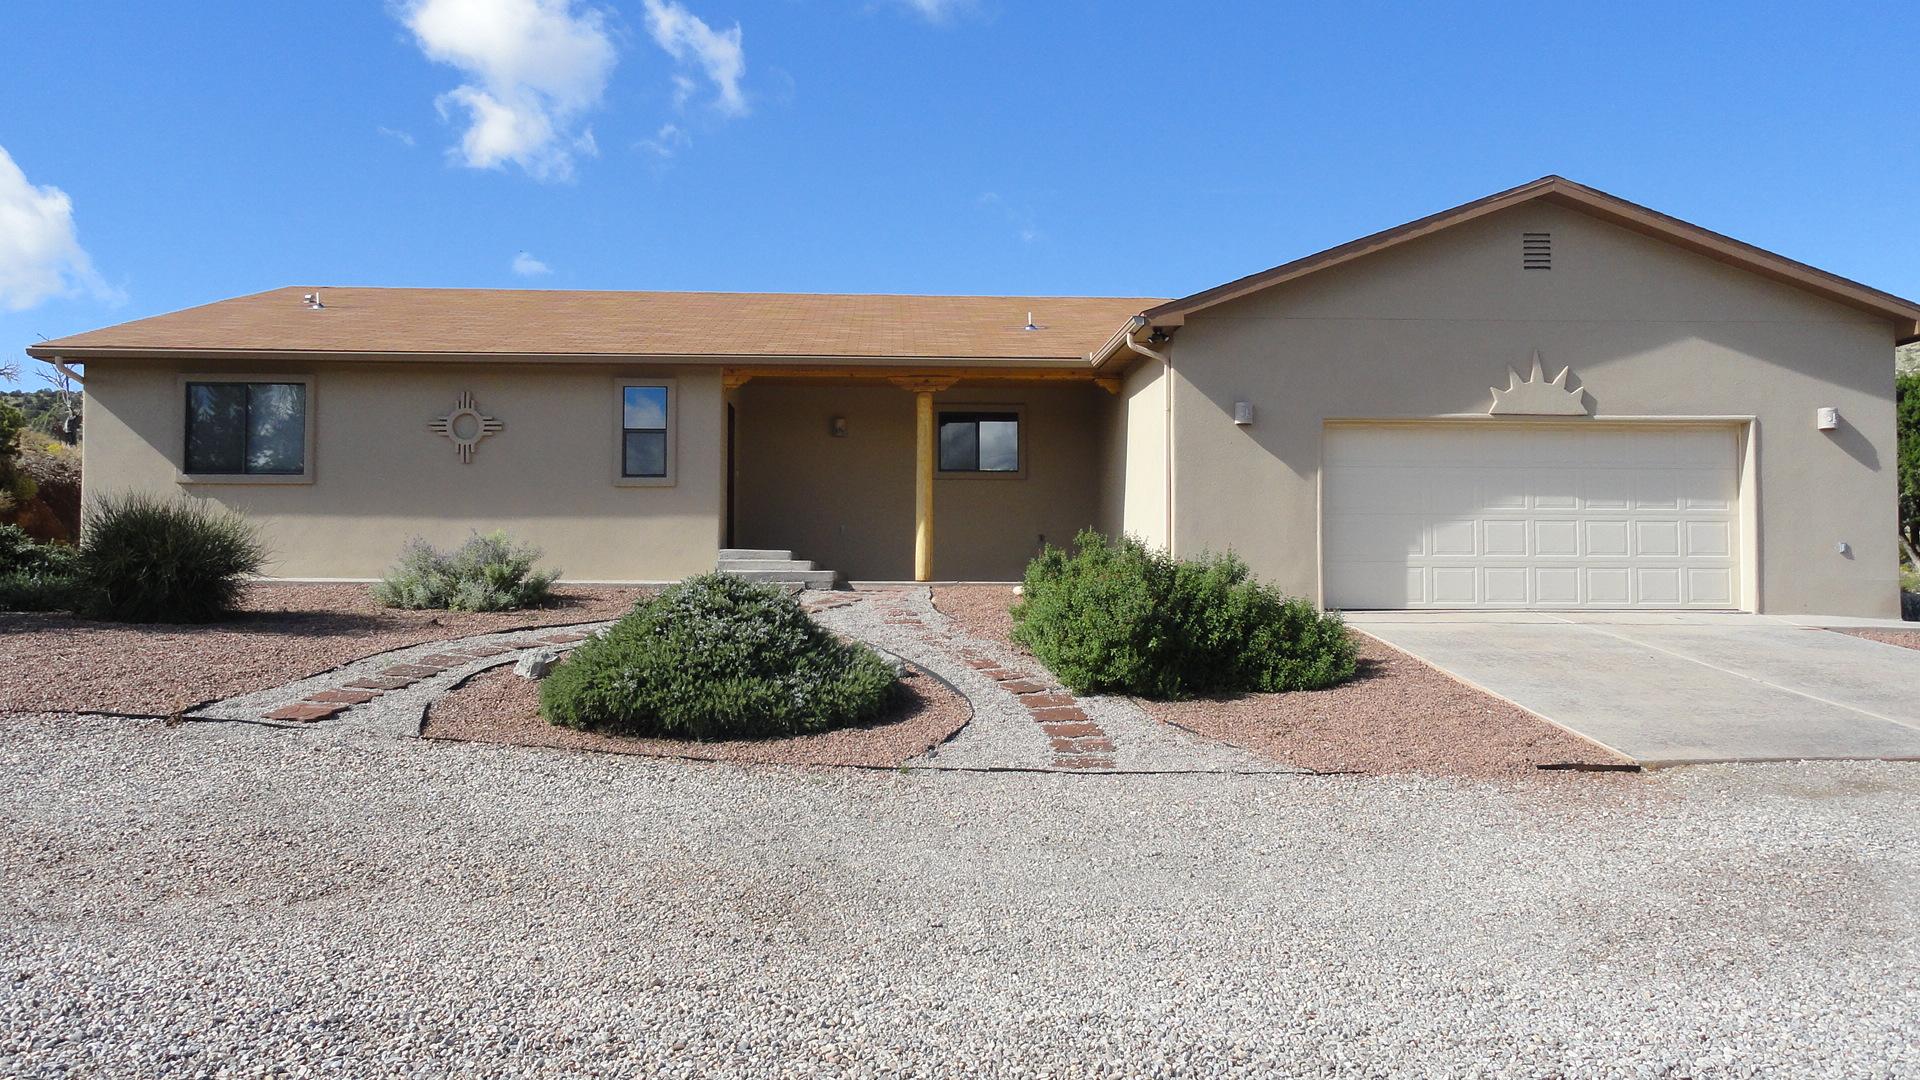 172 Fresnal Canyon Rd, La Luz, New Mexico 88337